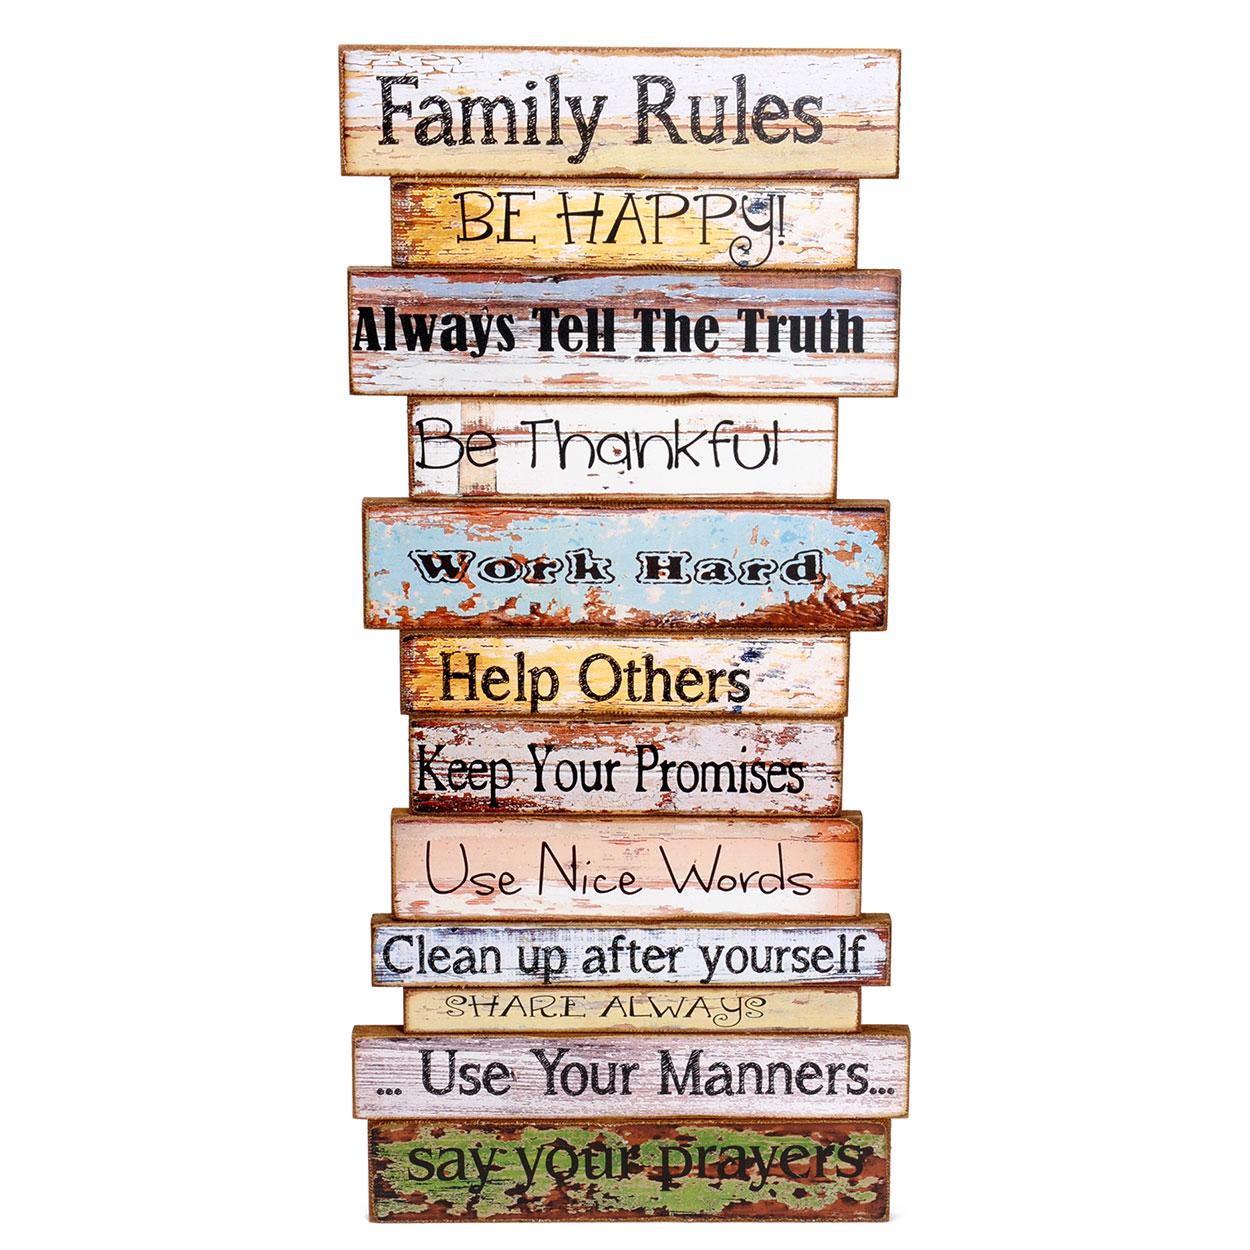 houten wanddecoratie family rules online kopen lobbesnl